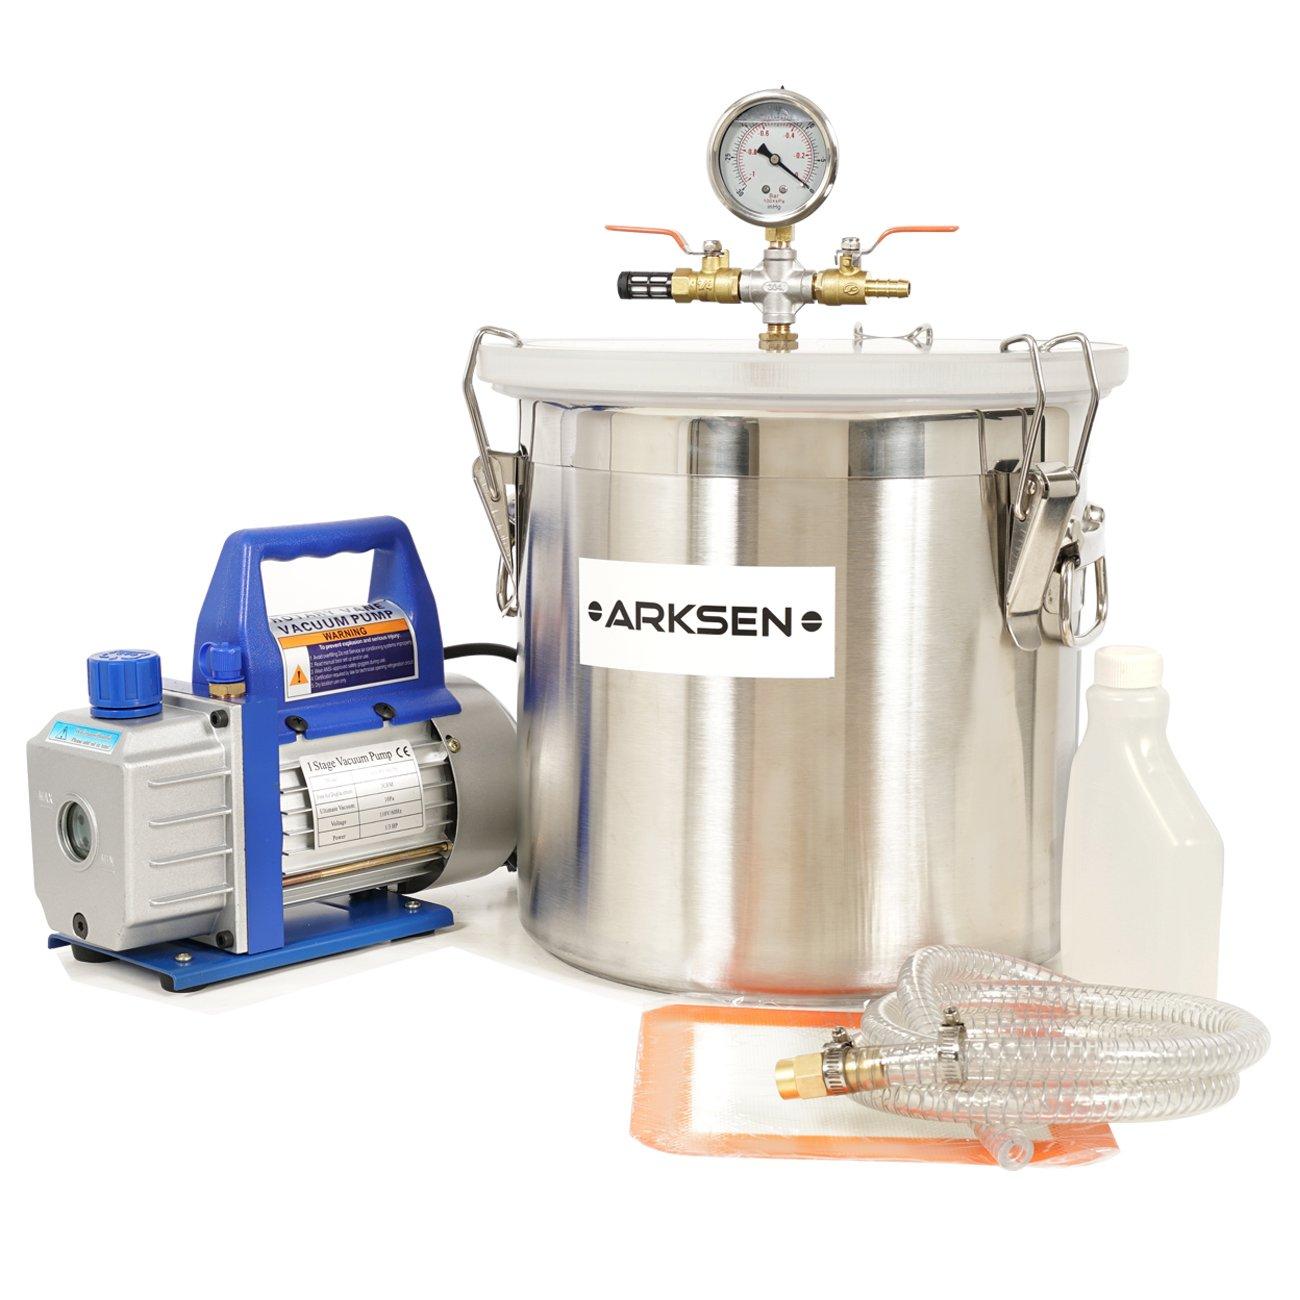 ARKSEN 5Gal Vacuum Chamber & 3CFM Deep Vane Pump, Degas Purge Epoxy Resin Kit